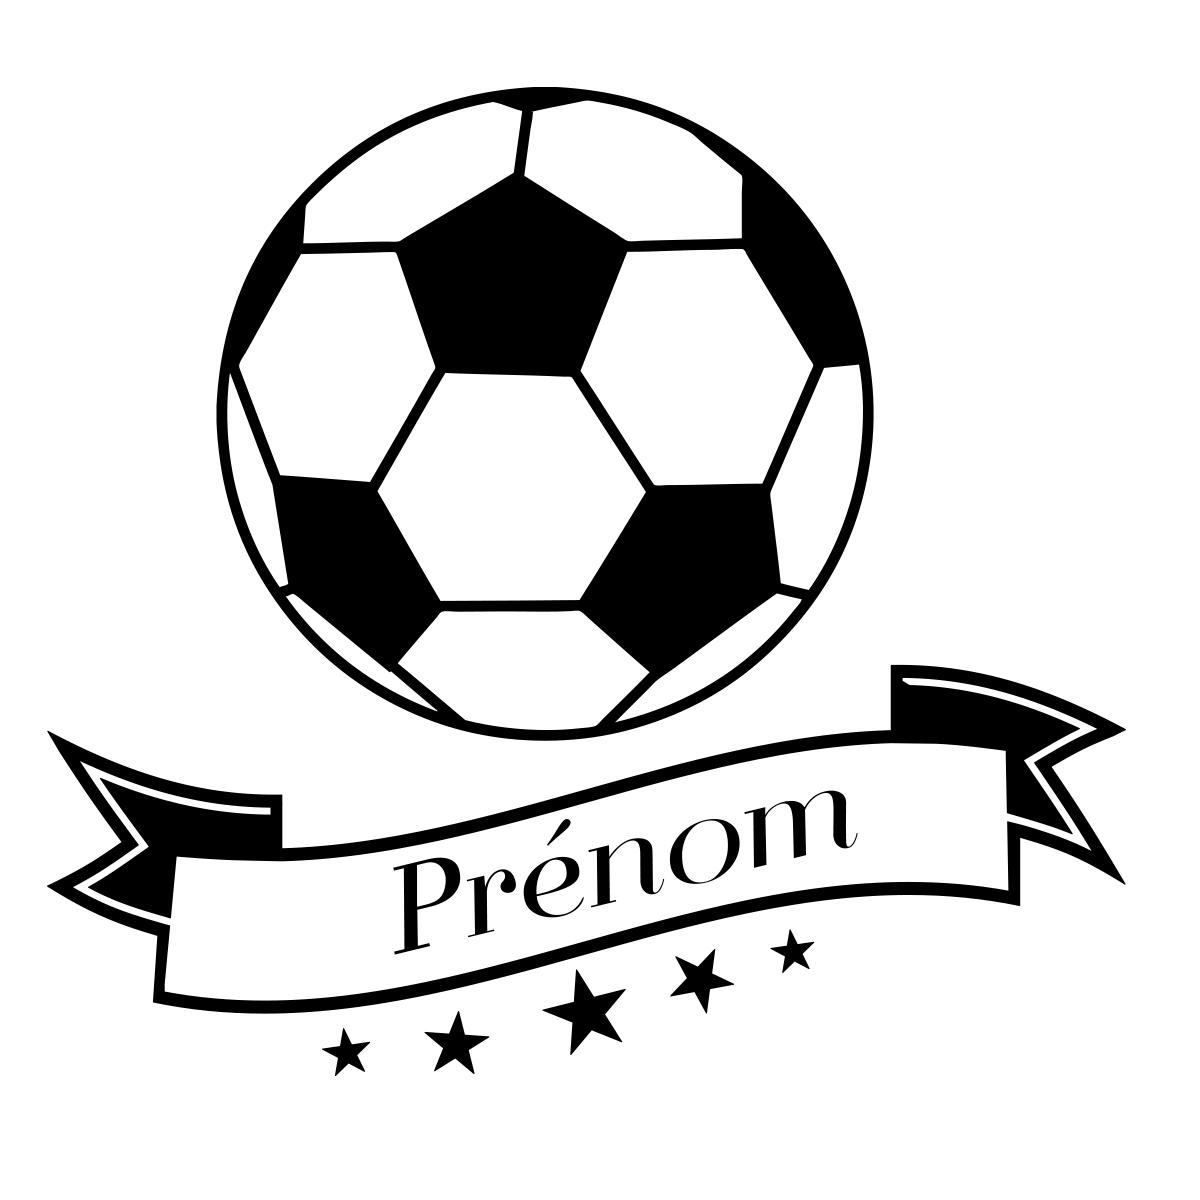 Sticker Prénom Personnalisable Ballon De Foot